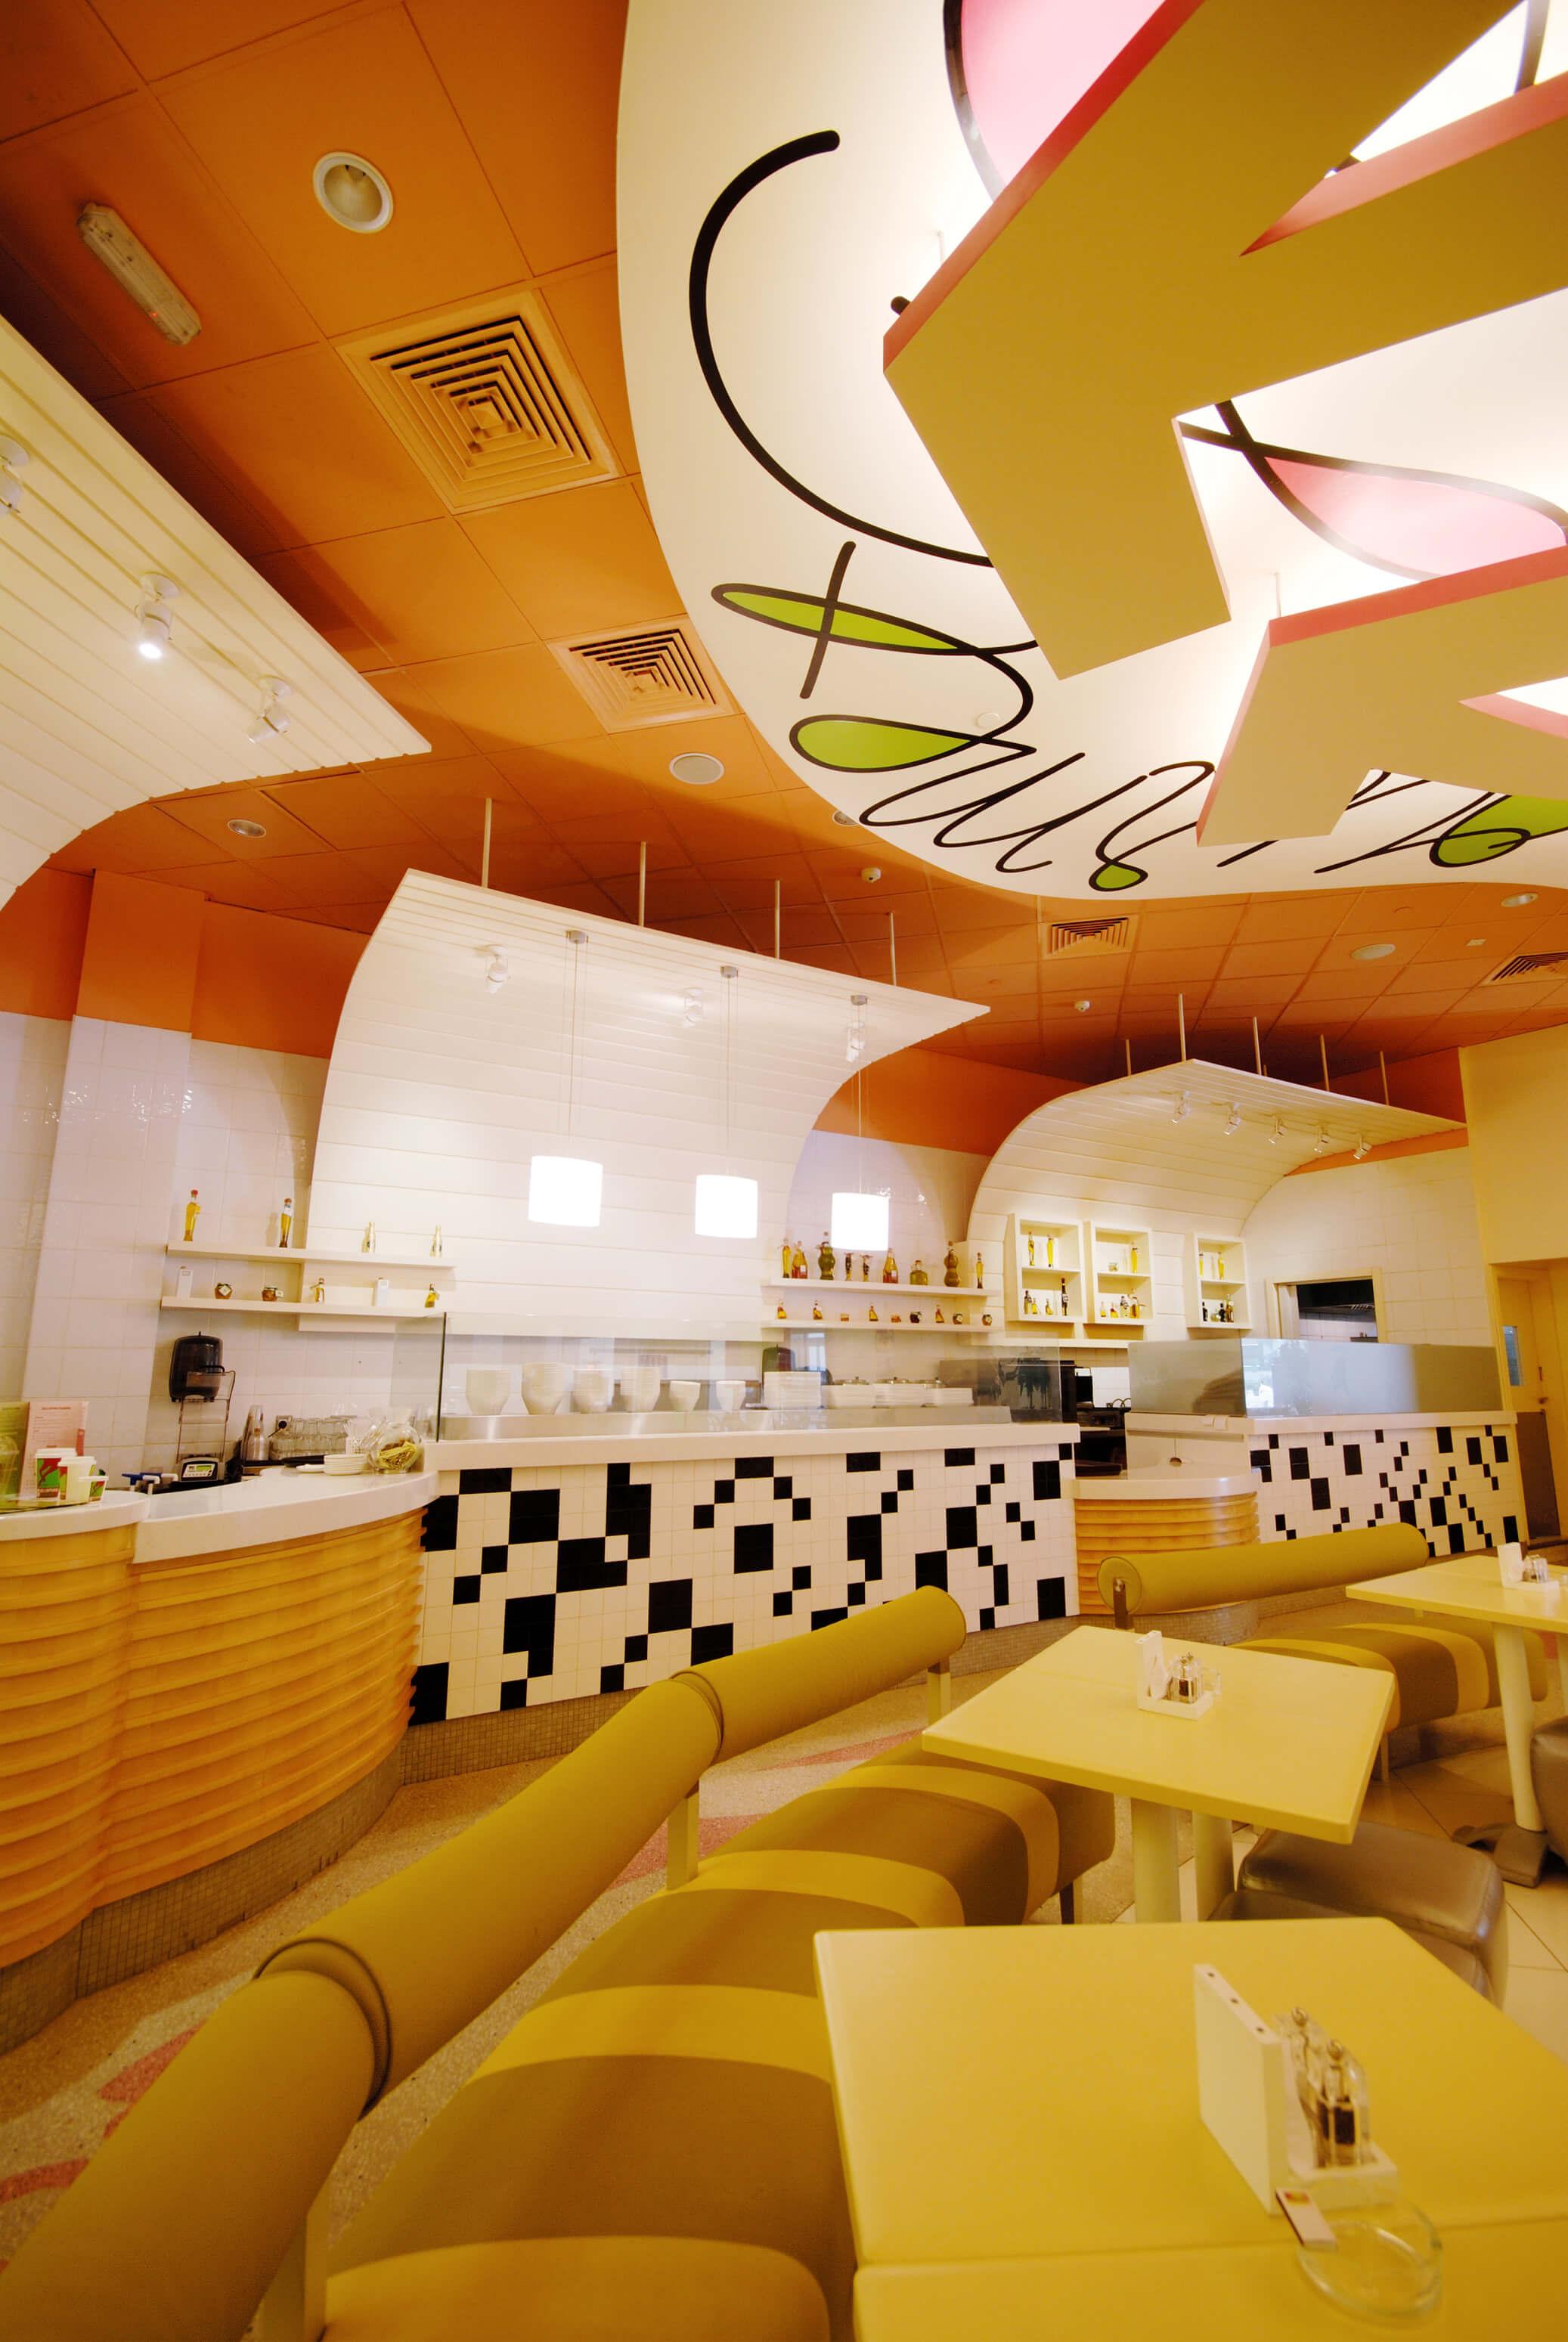 Gourmet Salad And Sandwich Cafe Interiors Interiorsense